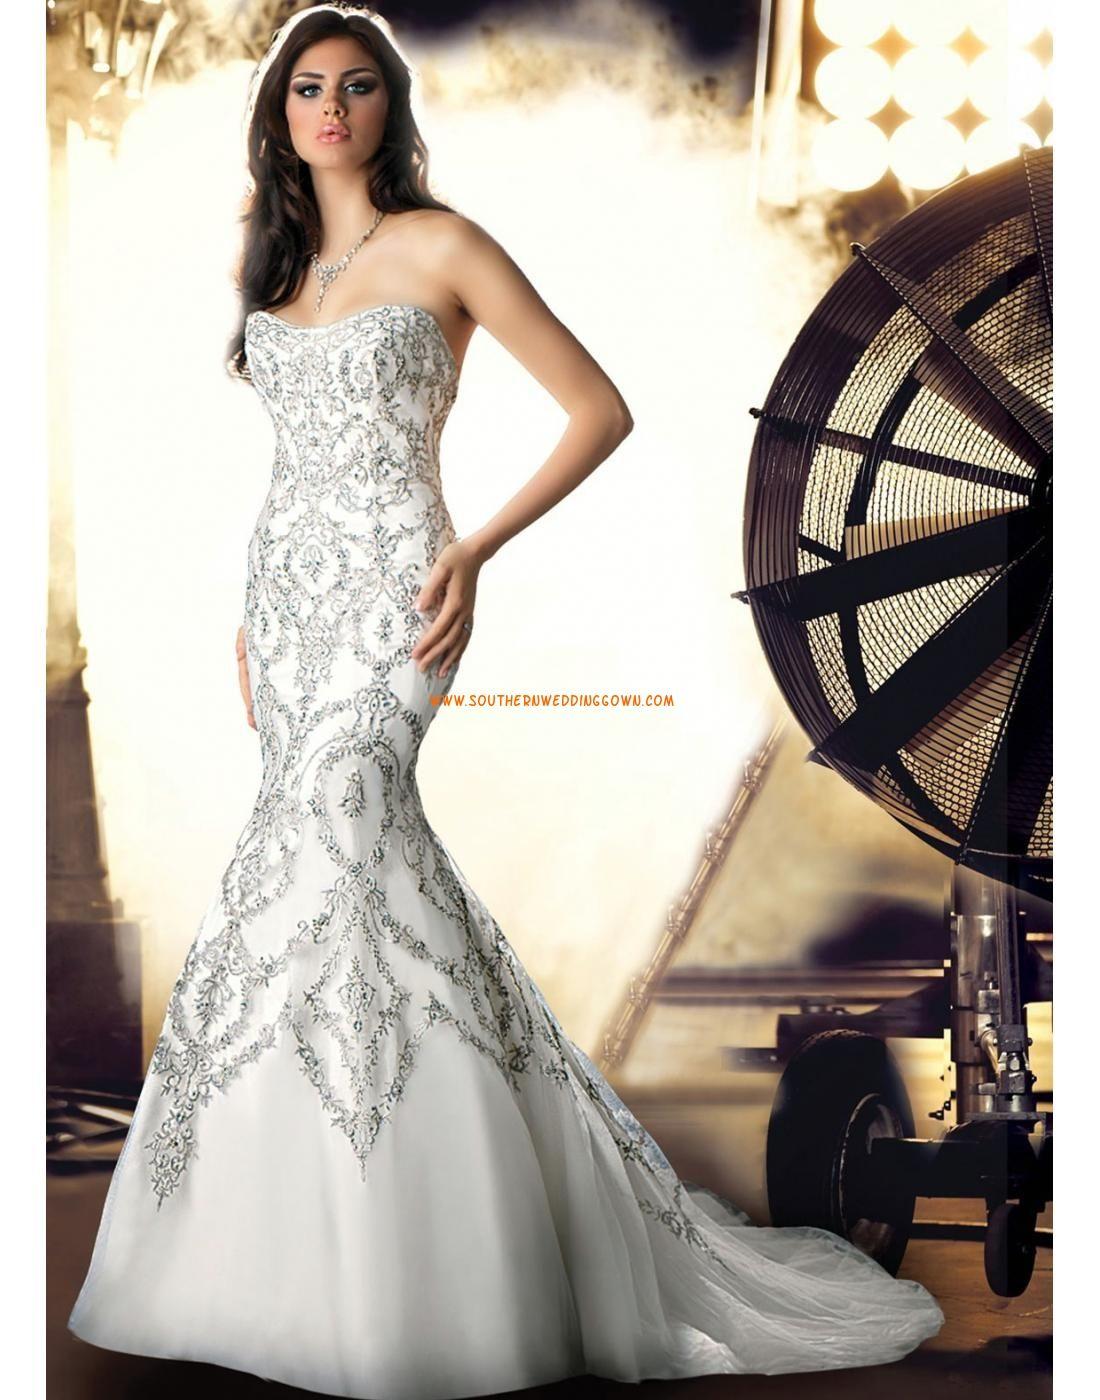 Sweep Släp Vintageinsprirerad Axelbandslös Bröllopsklänningar 2014